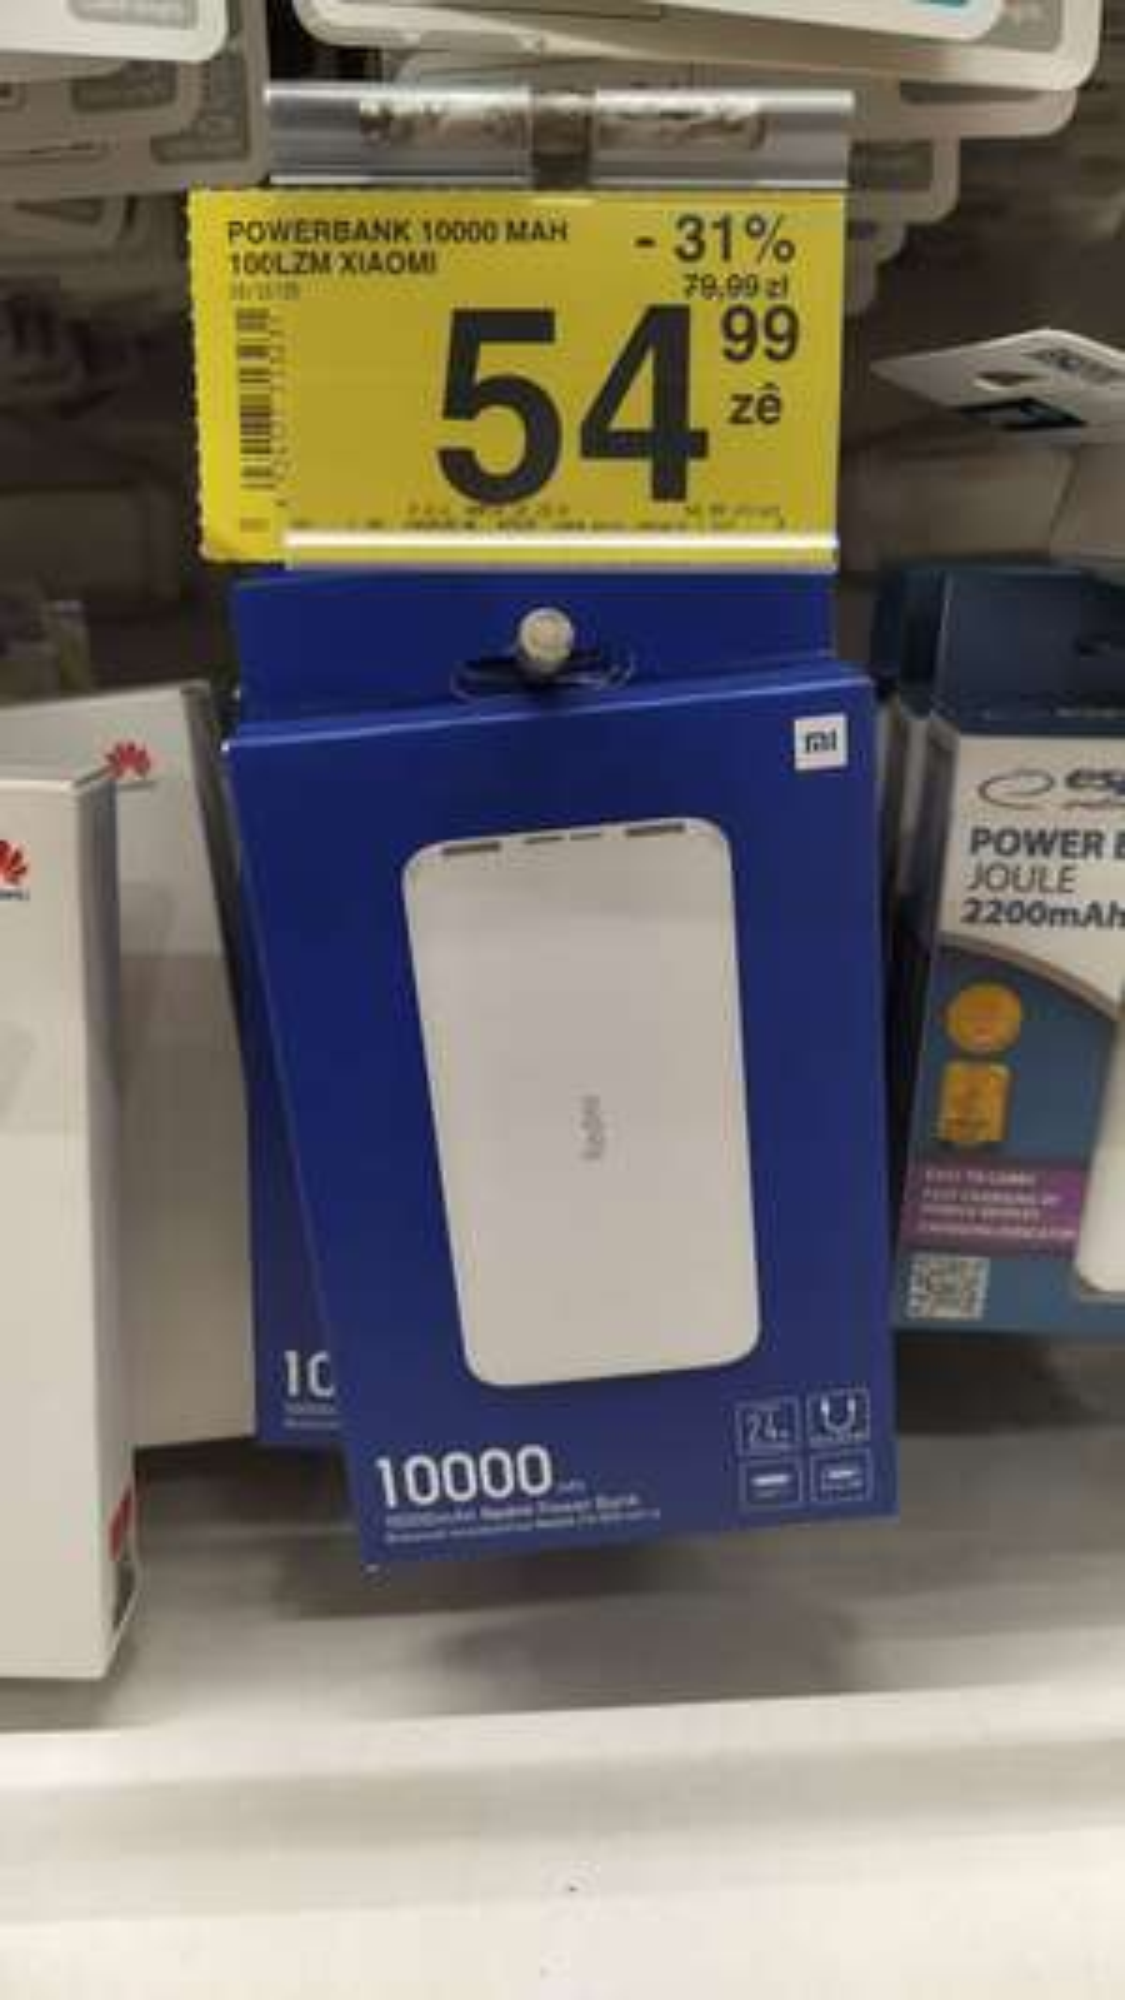 Powerbank Xiaomi 10 000 mAh